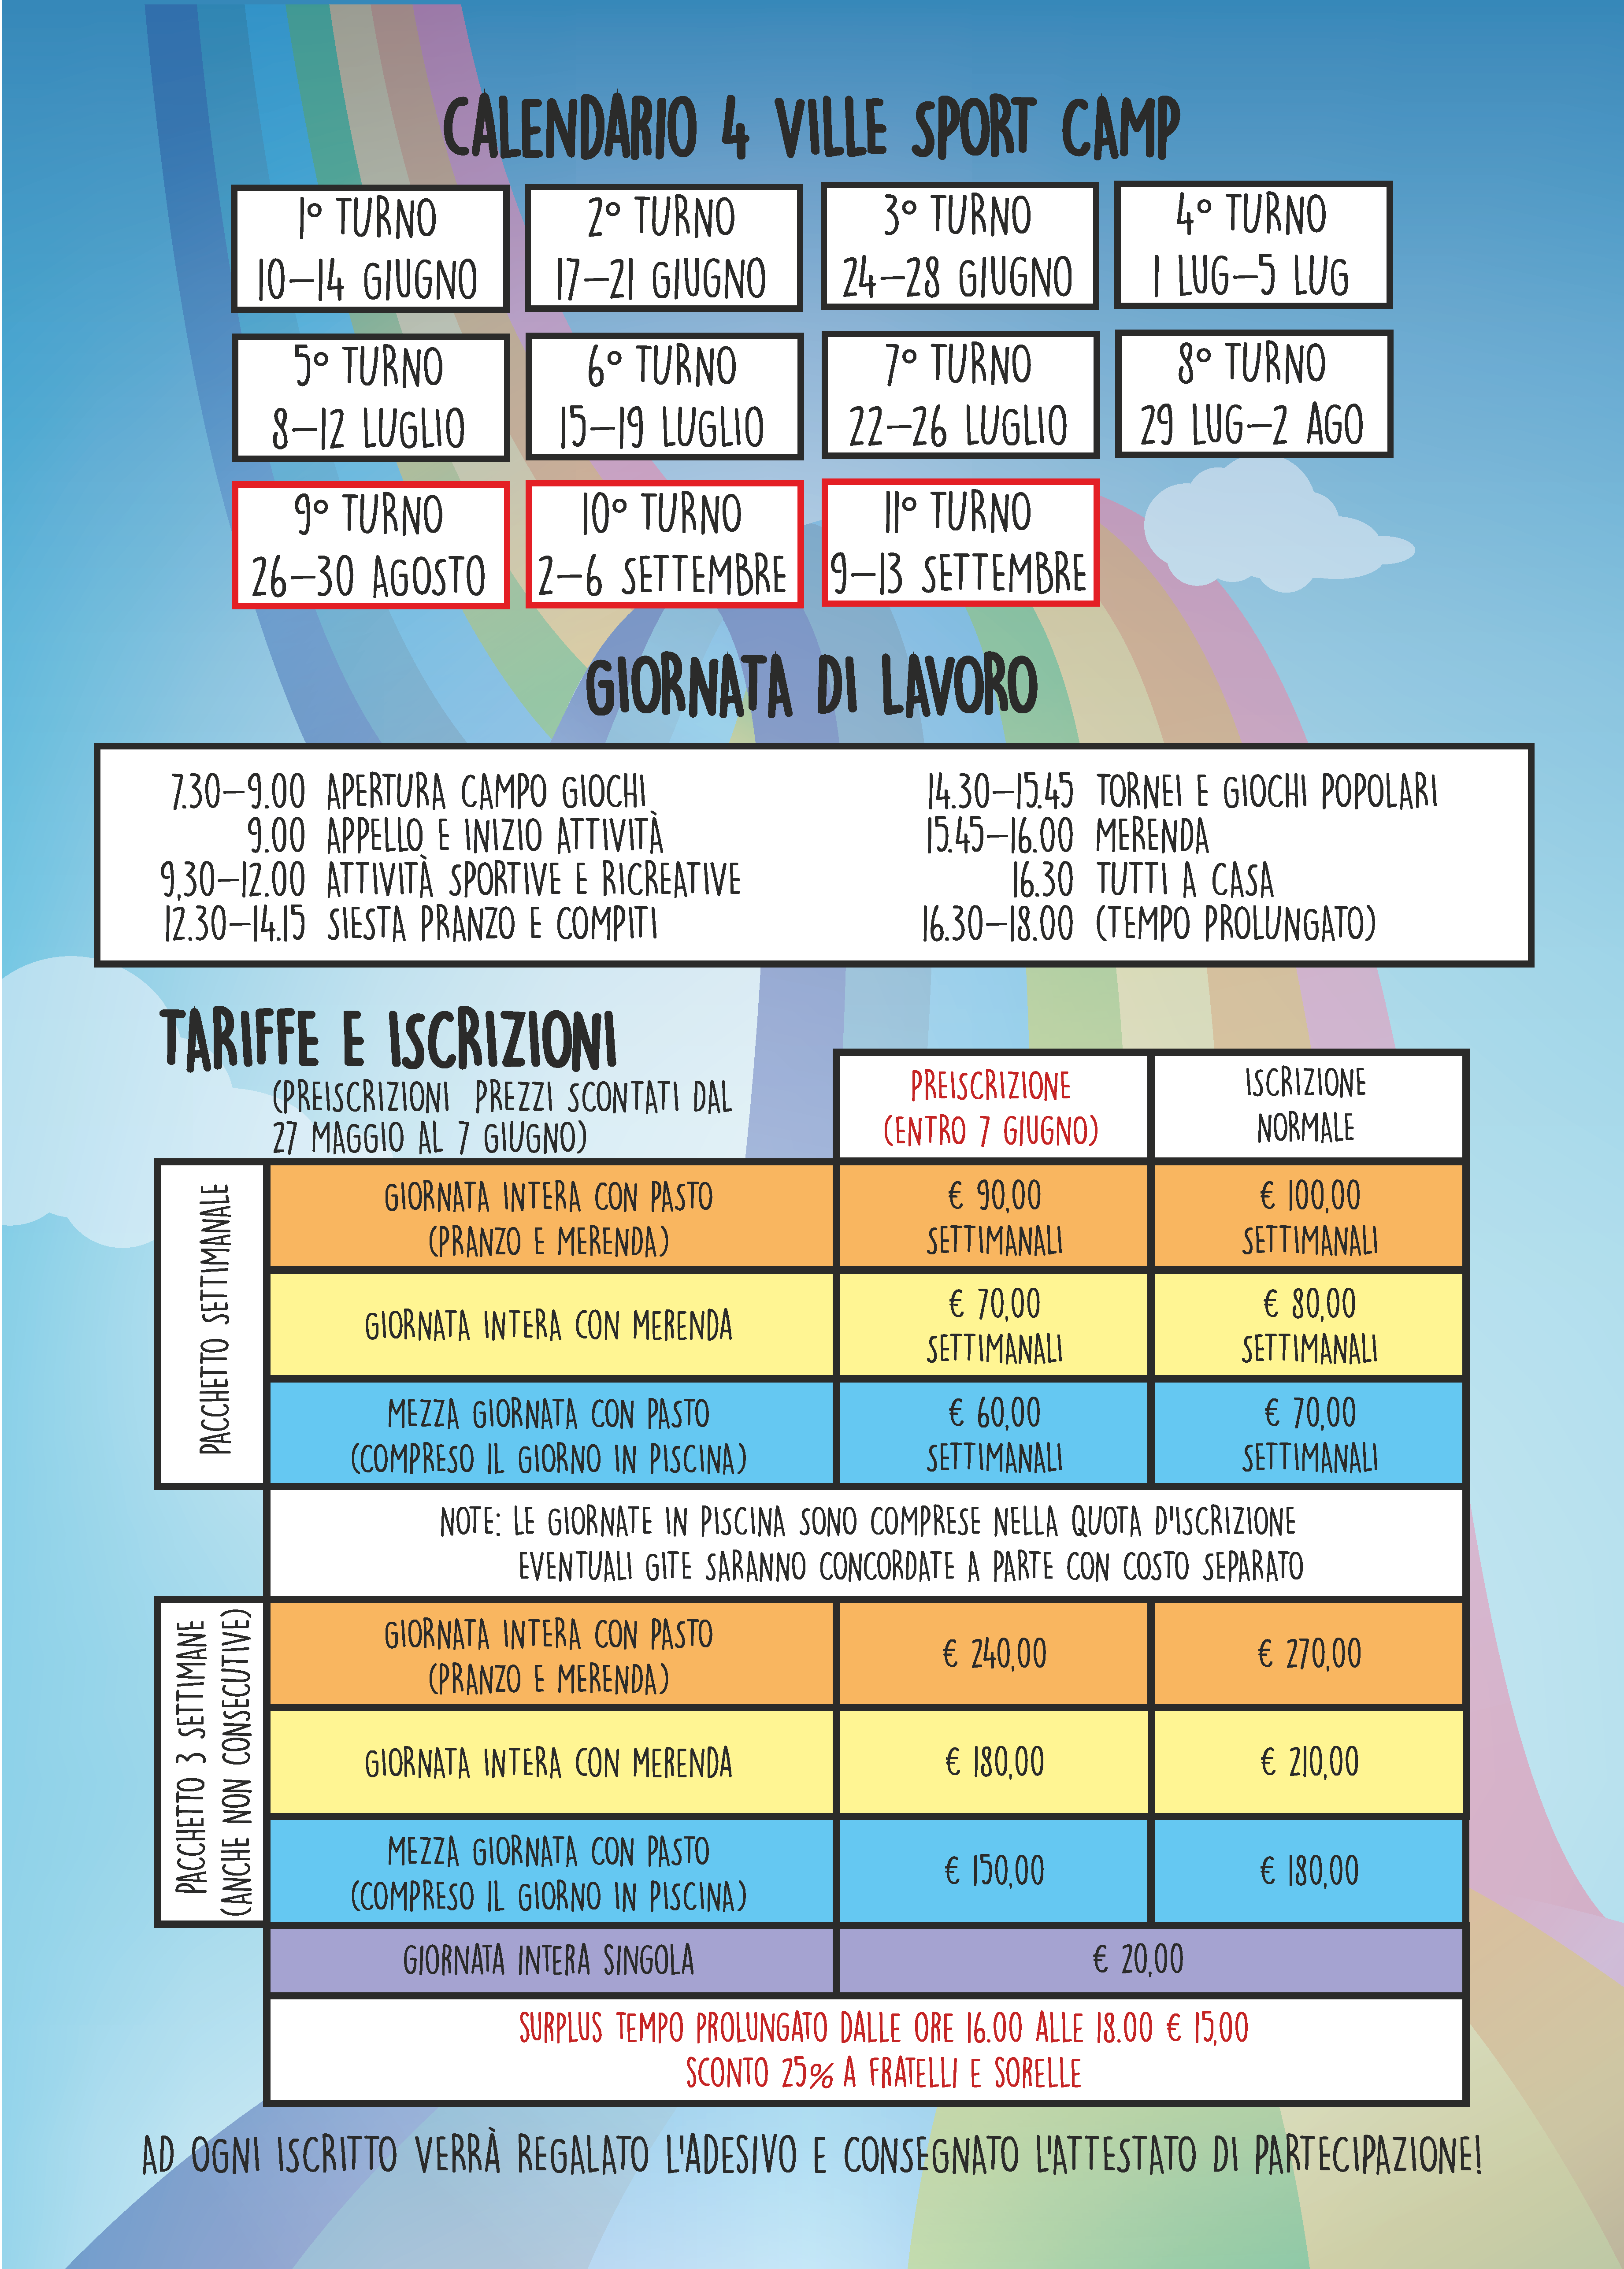 Pagina Calendario Settimanale.Polisportiva 4 Ville A C R S D 4 Ville Sport Camp